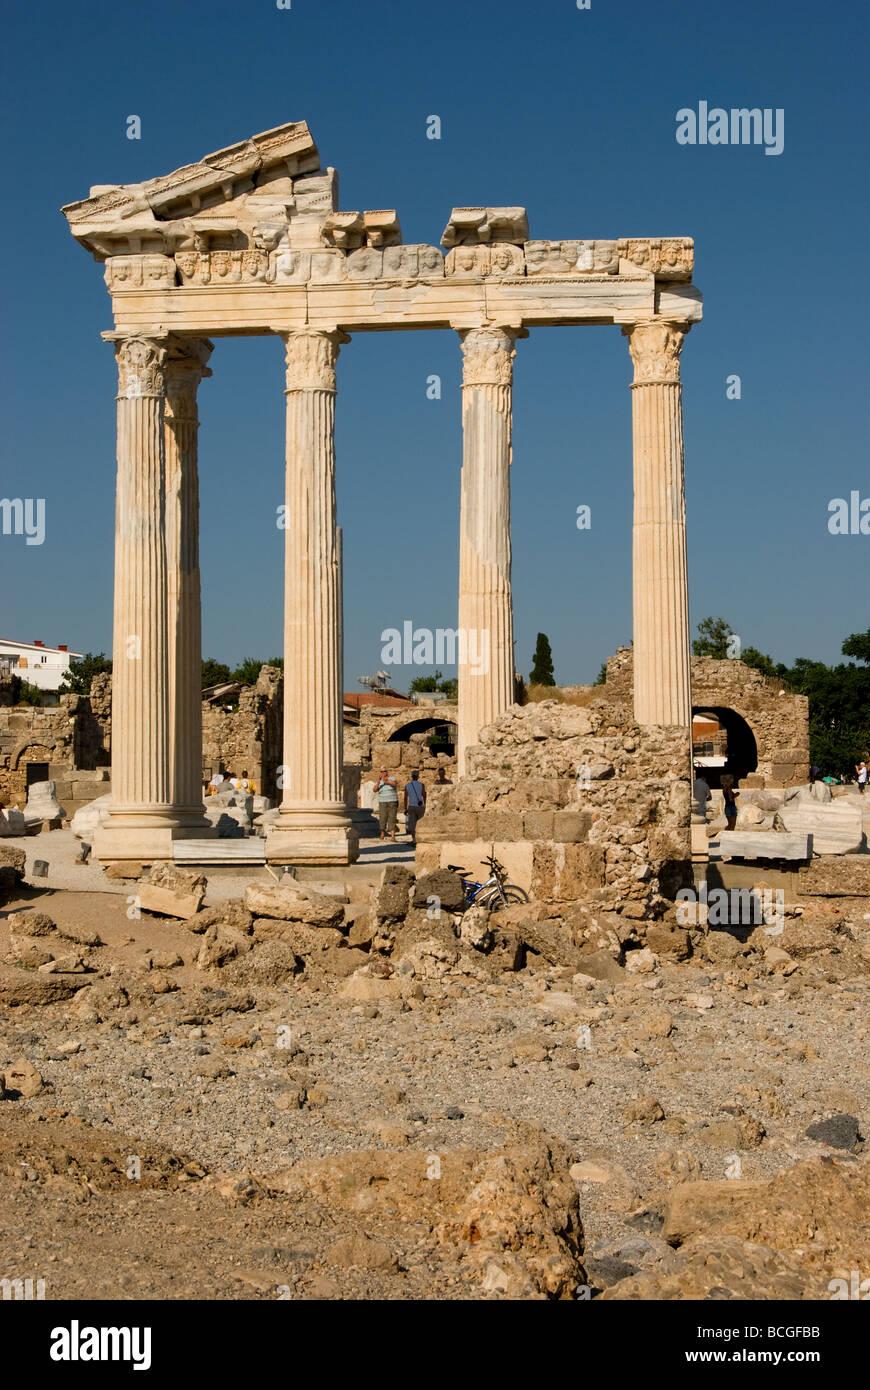 Temple of Apollo and Athena in Side, Turkey Stock Photo ...